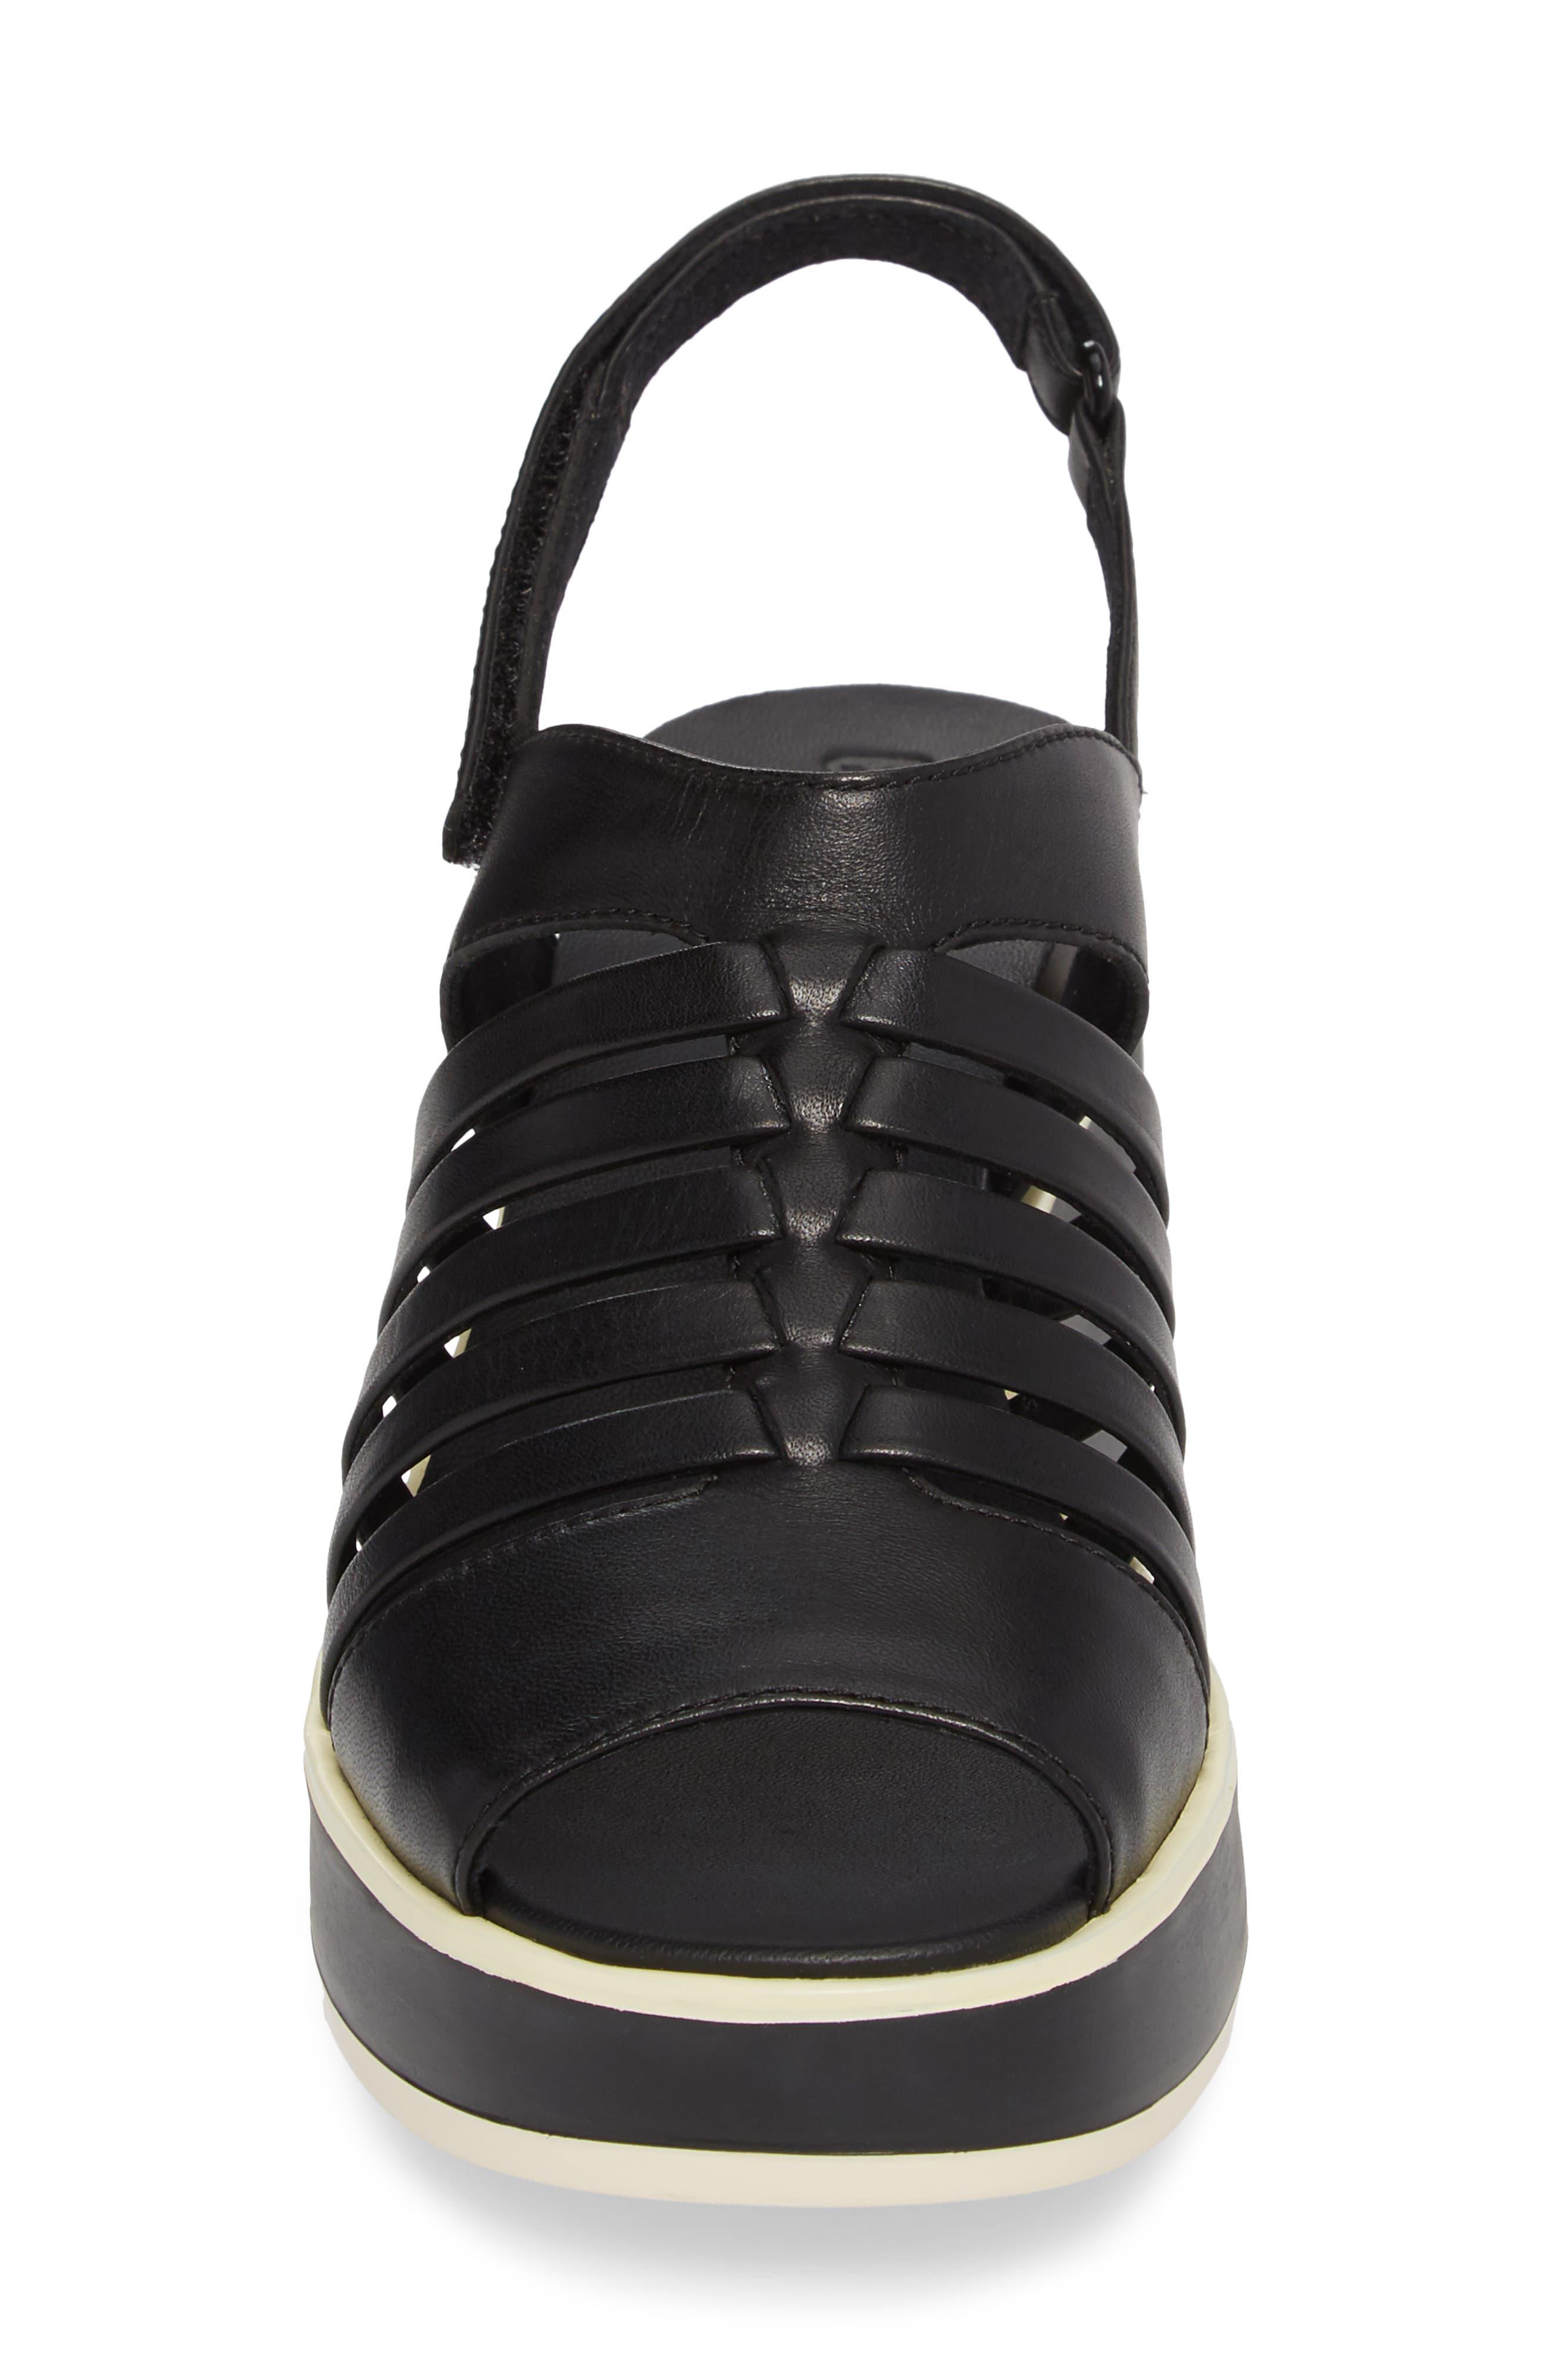 Tropik Strappy Wedge Sandal,                             Alternate thumbnail 4, color,                             Black Leather